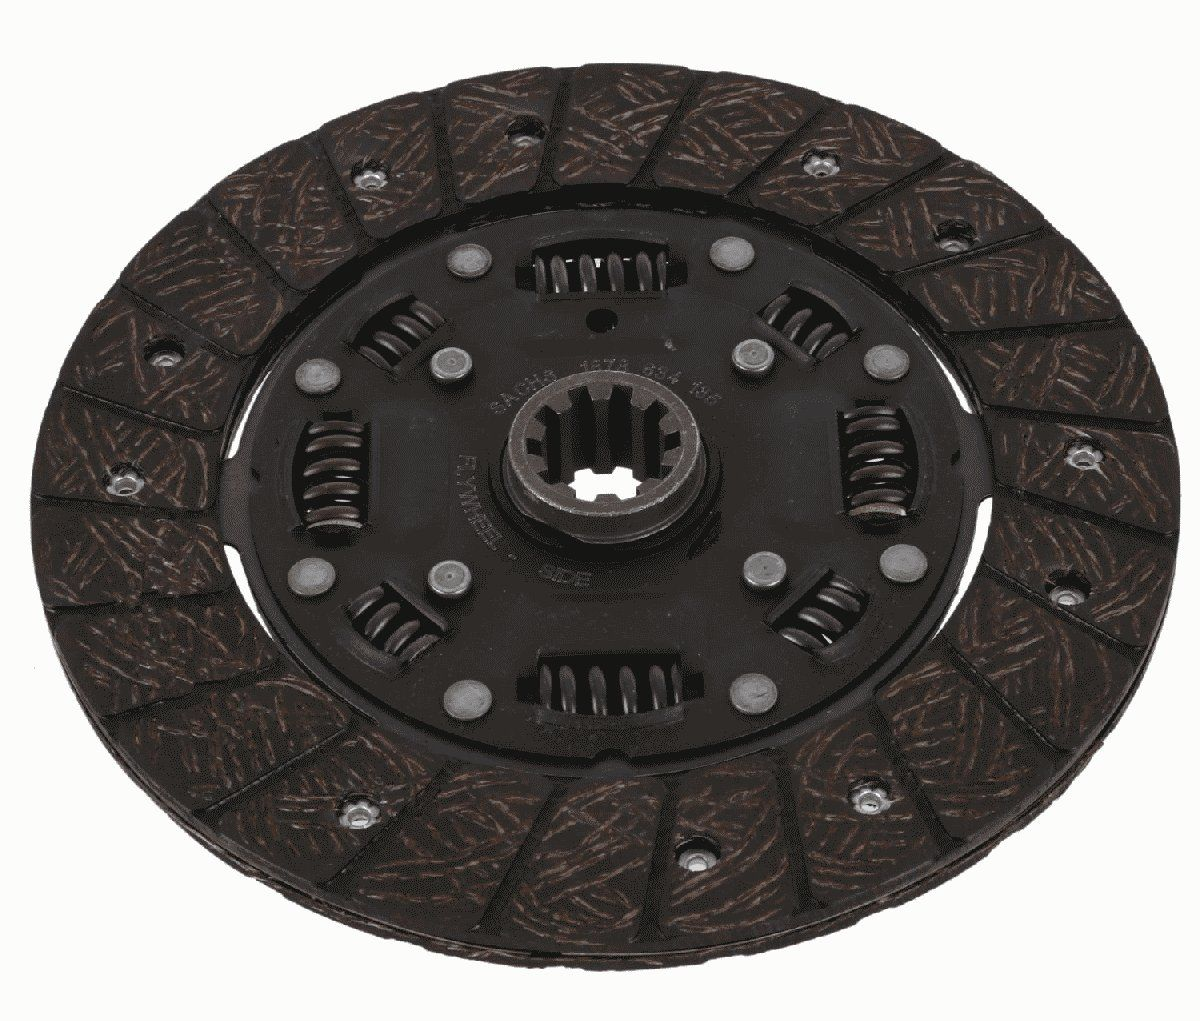 Buy original Clutch plate SACHS 1878 634 135